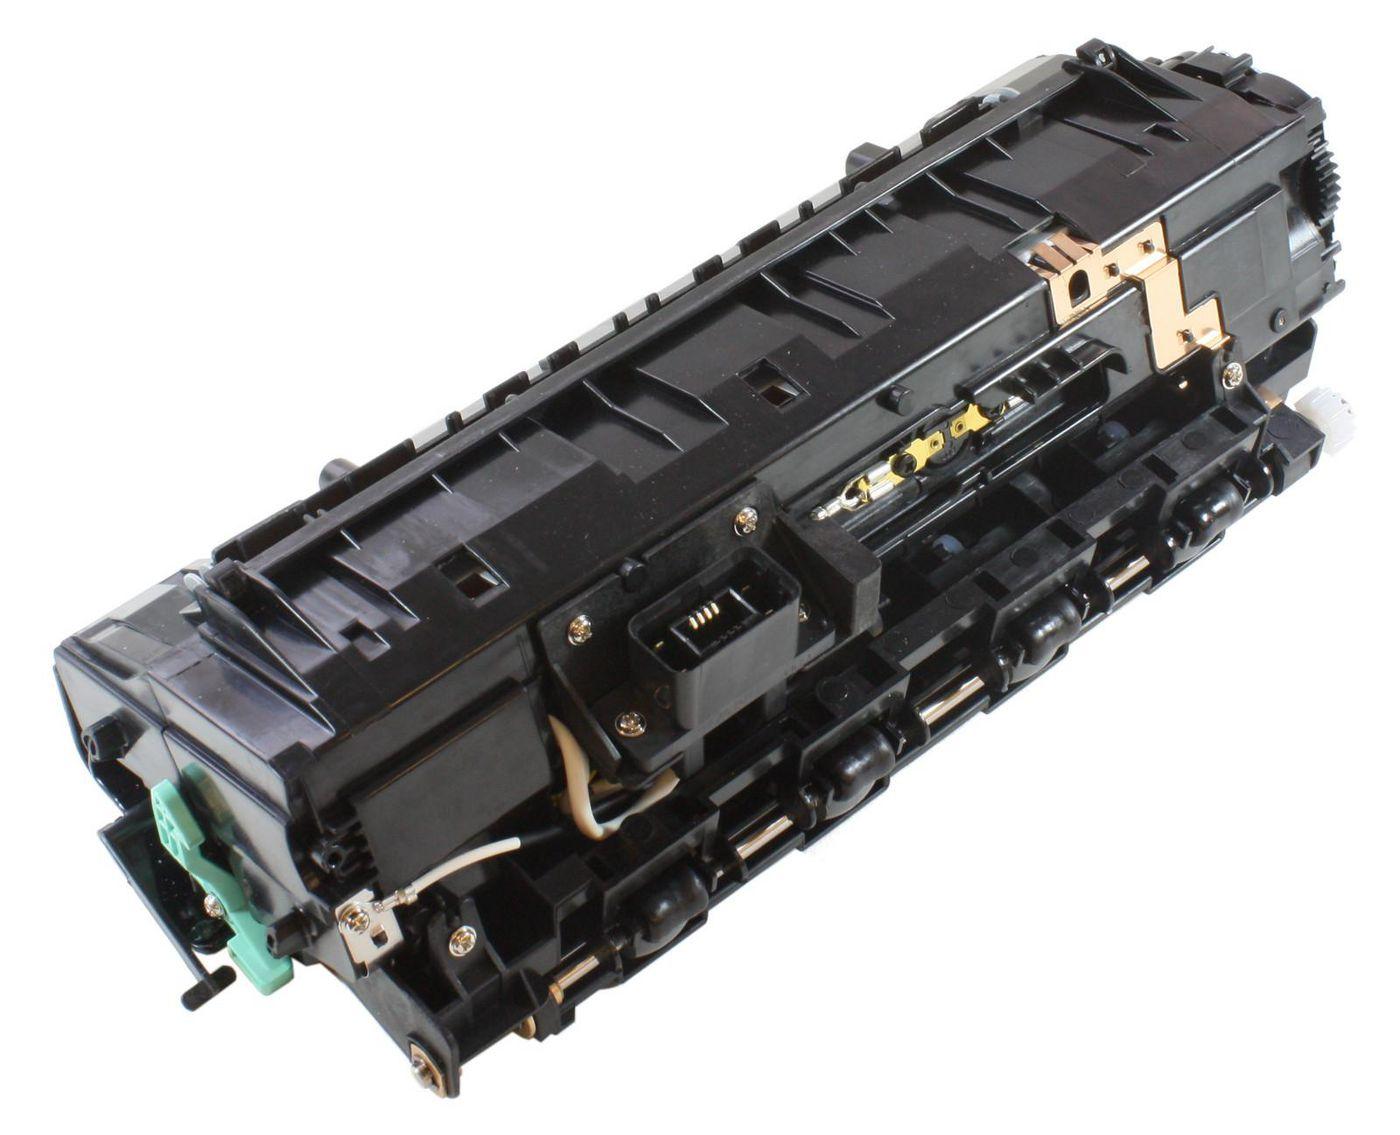 Samsung JC9604496A Fuser kit